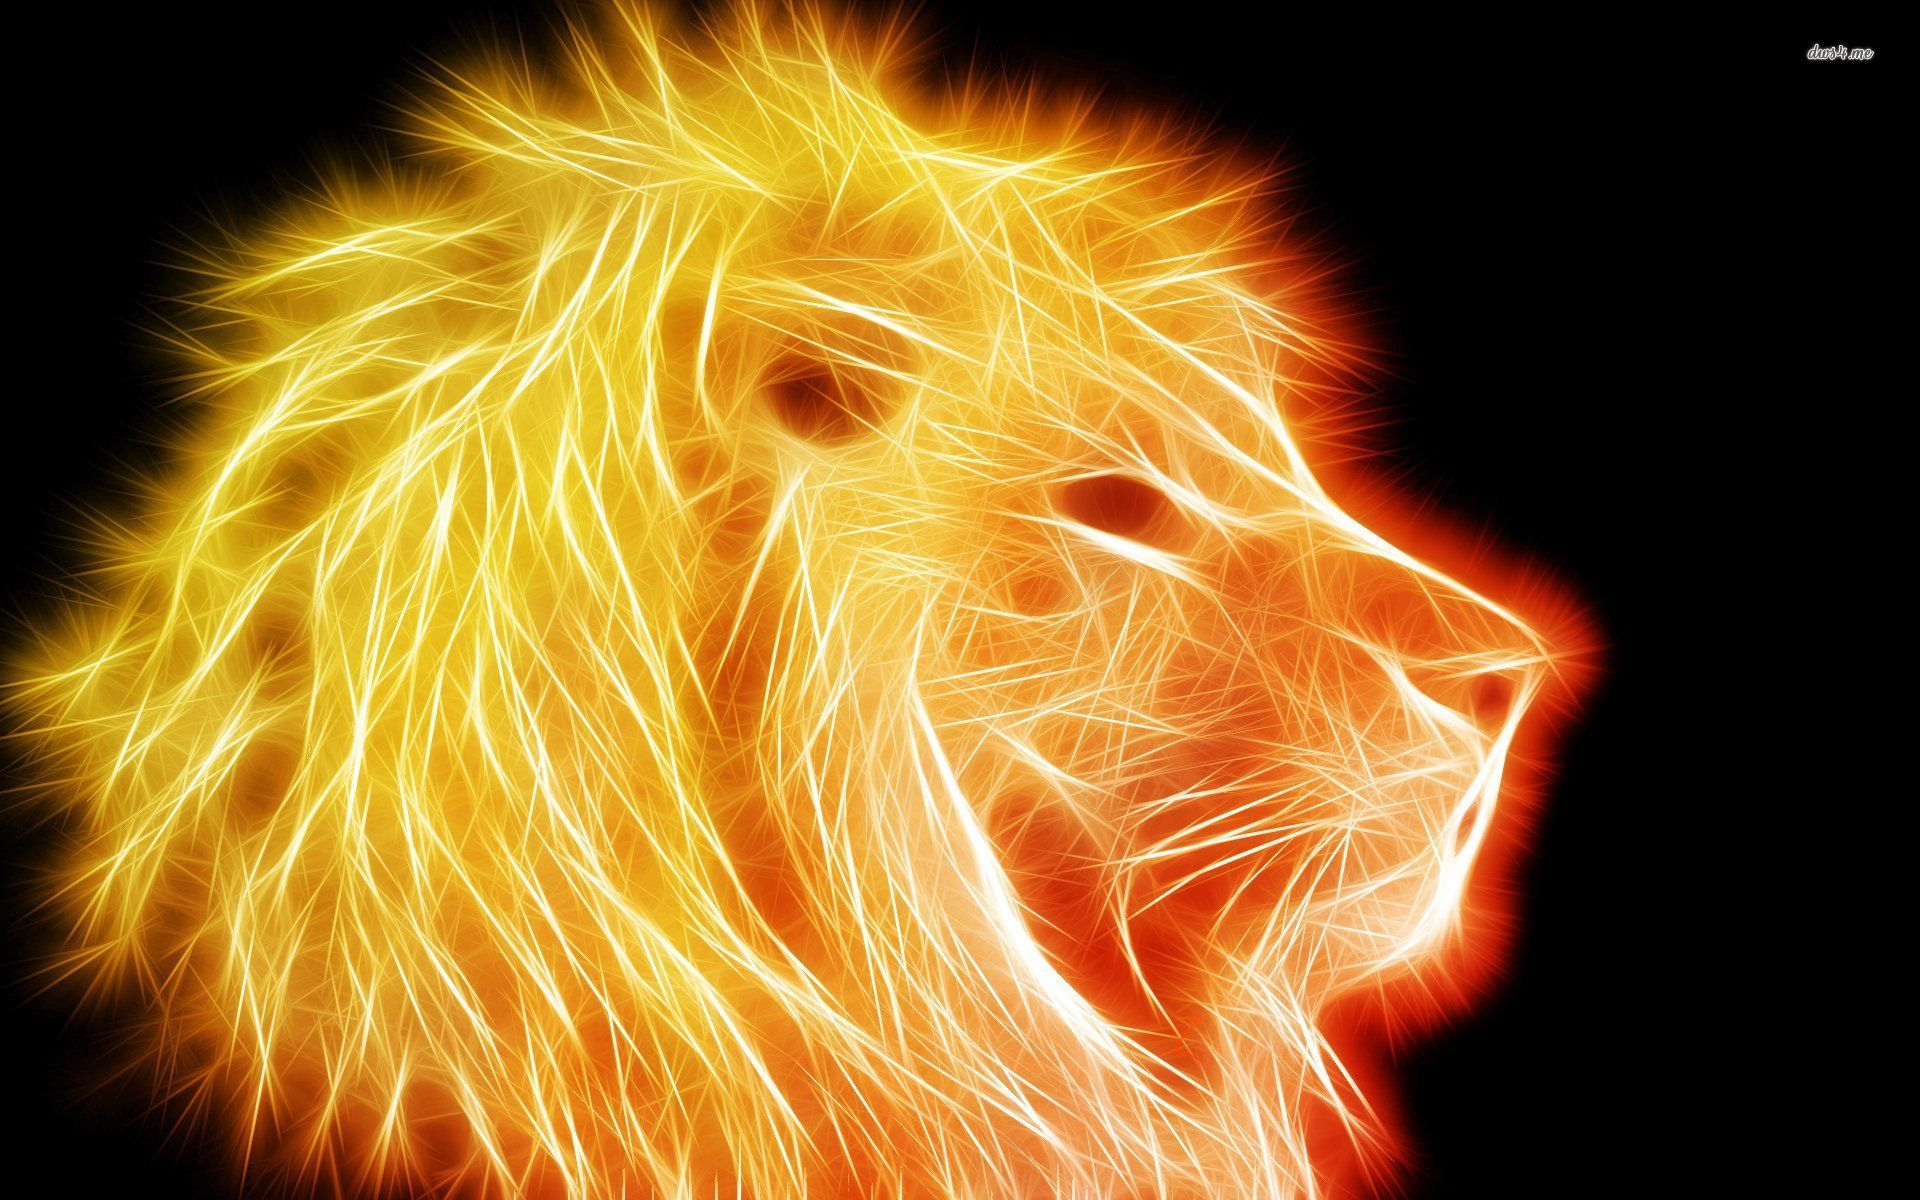 Glowing Golden Lion Wallpaper - Lion Hd Wallpaper Neon , HD Wallpaper & Backgrounds